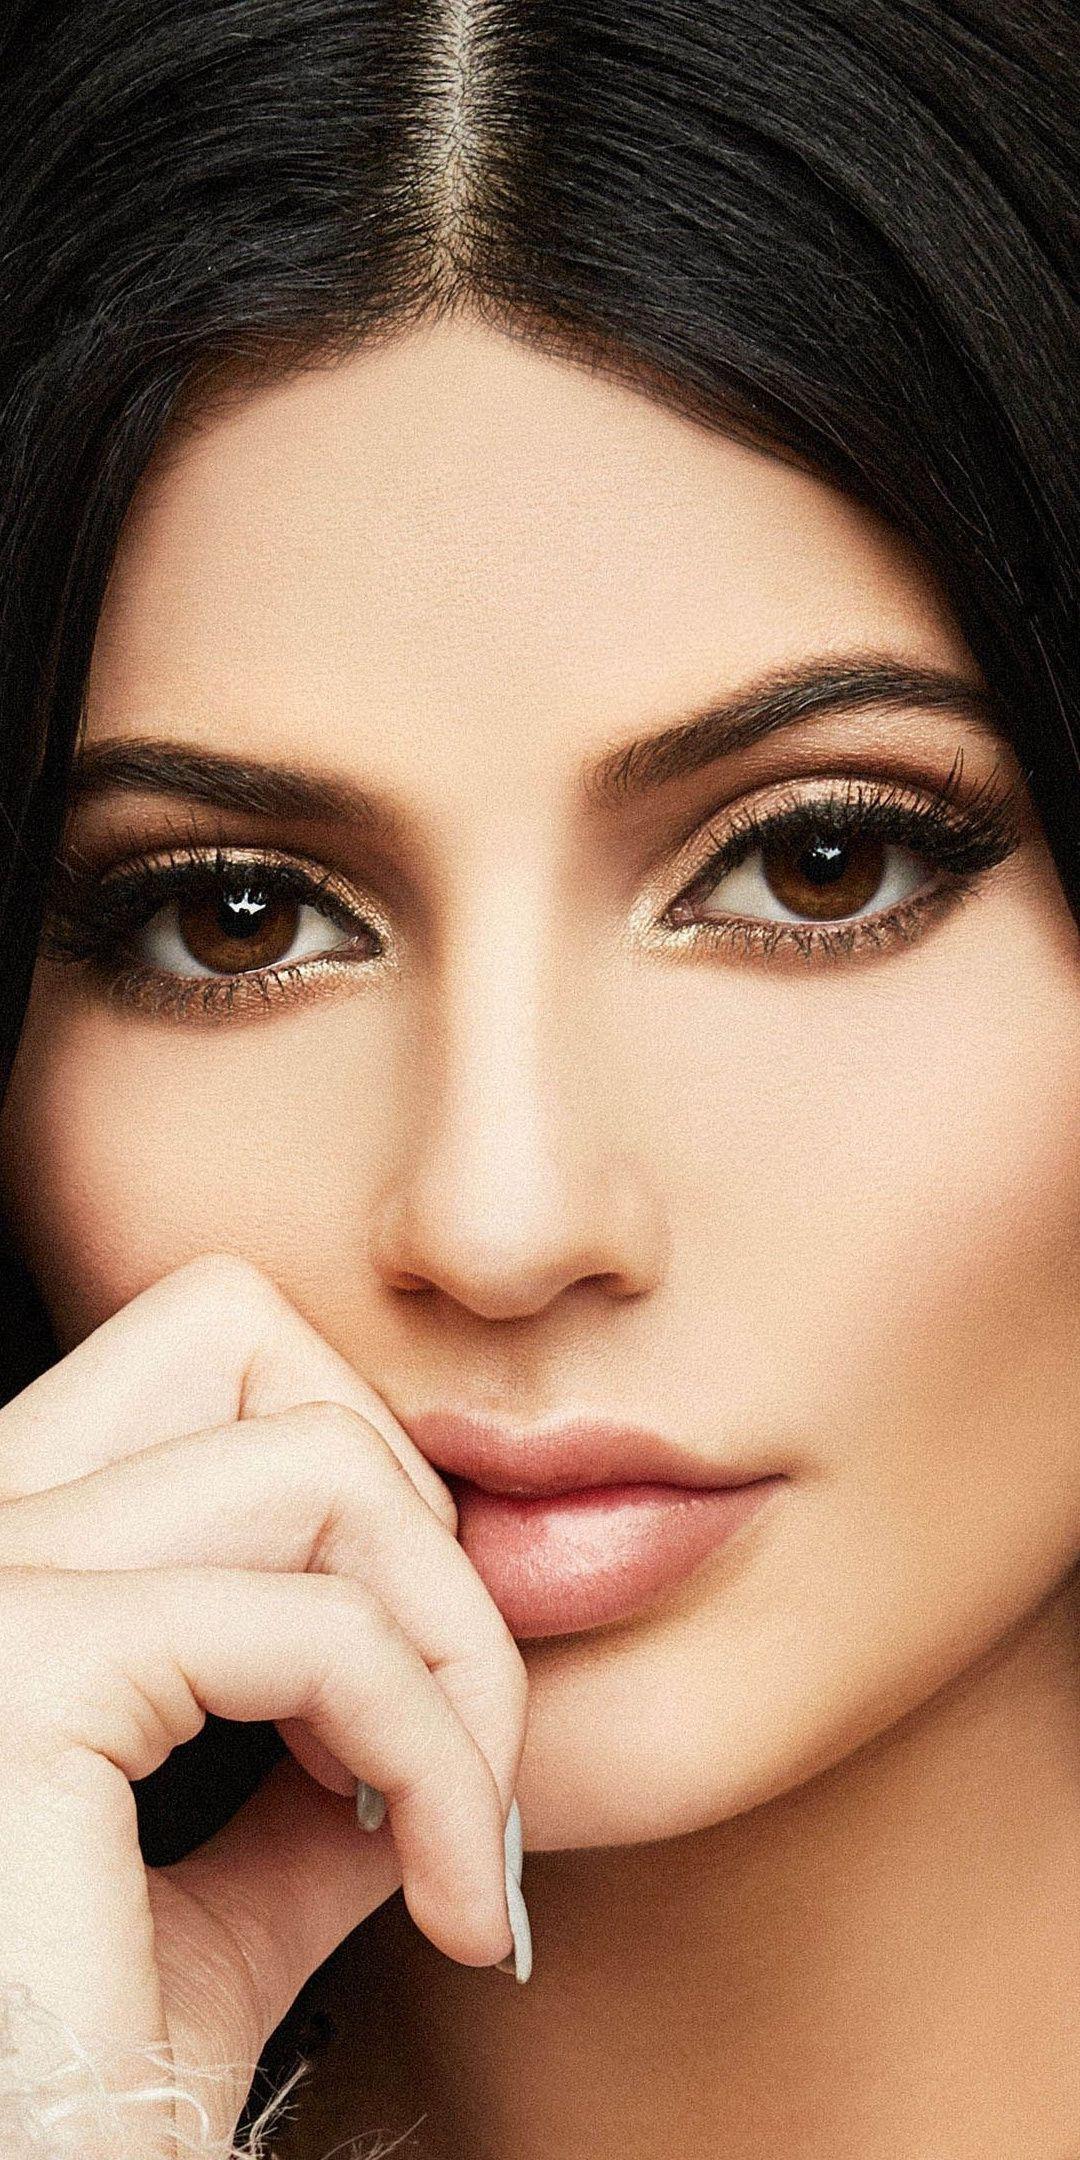 Kylie Jenner, supermodel, dark hair, beautiful, 1080x2160